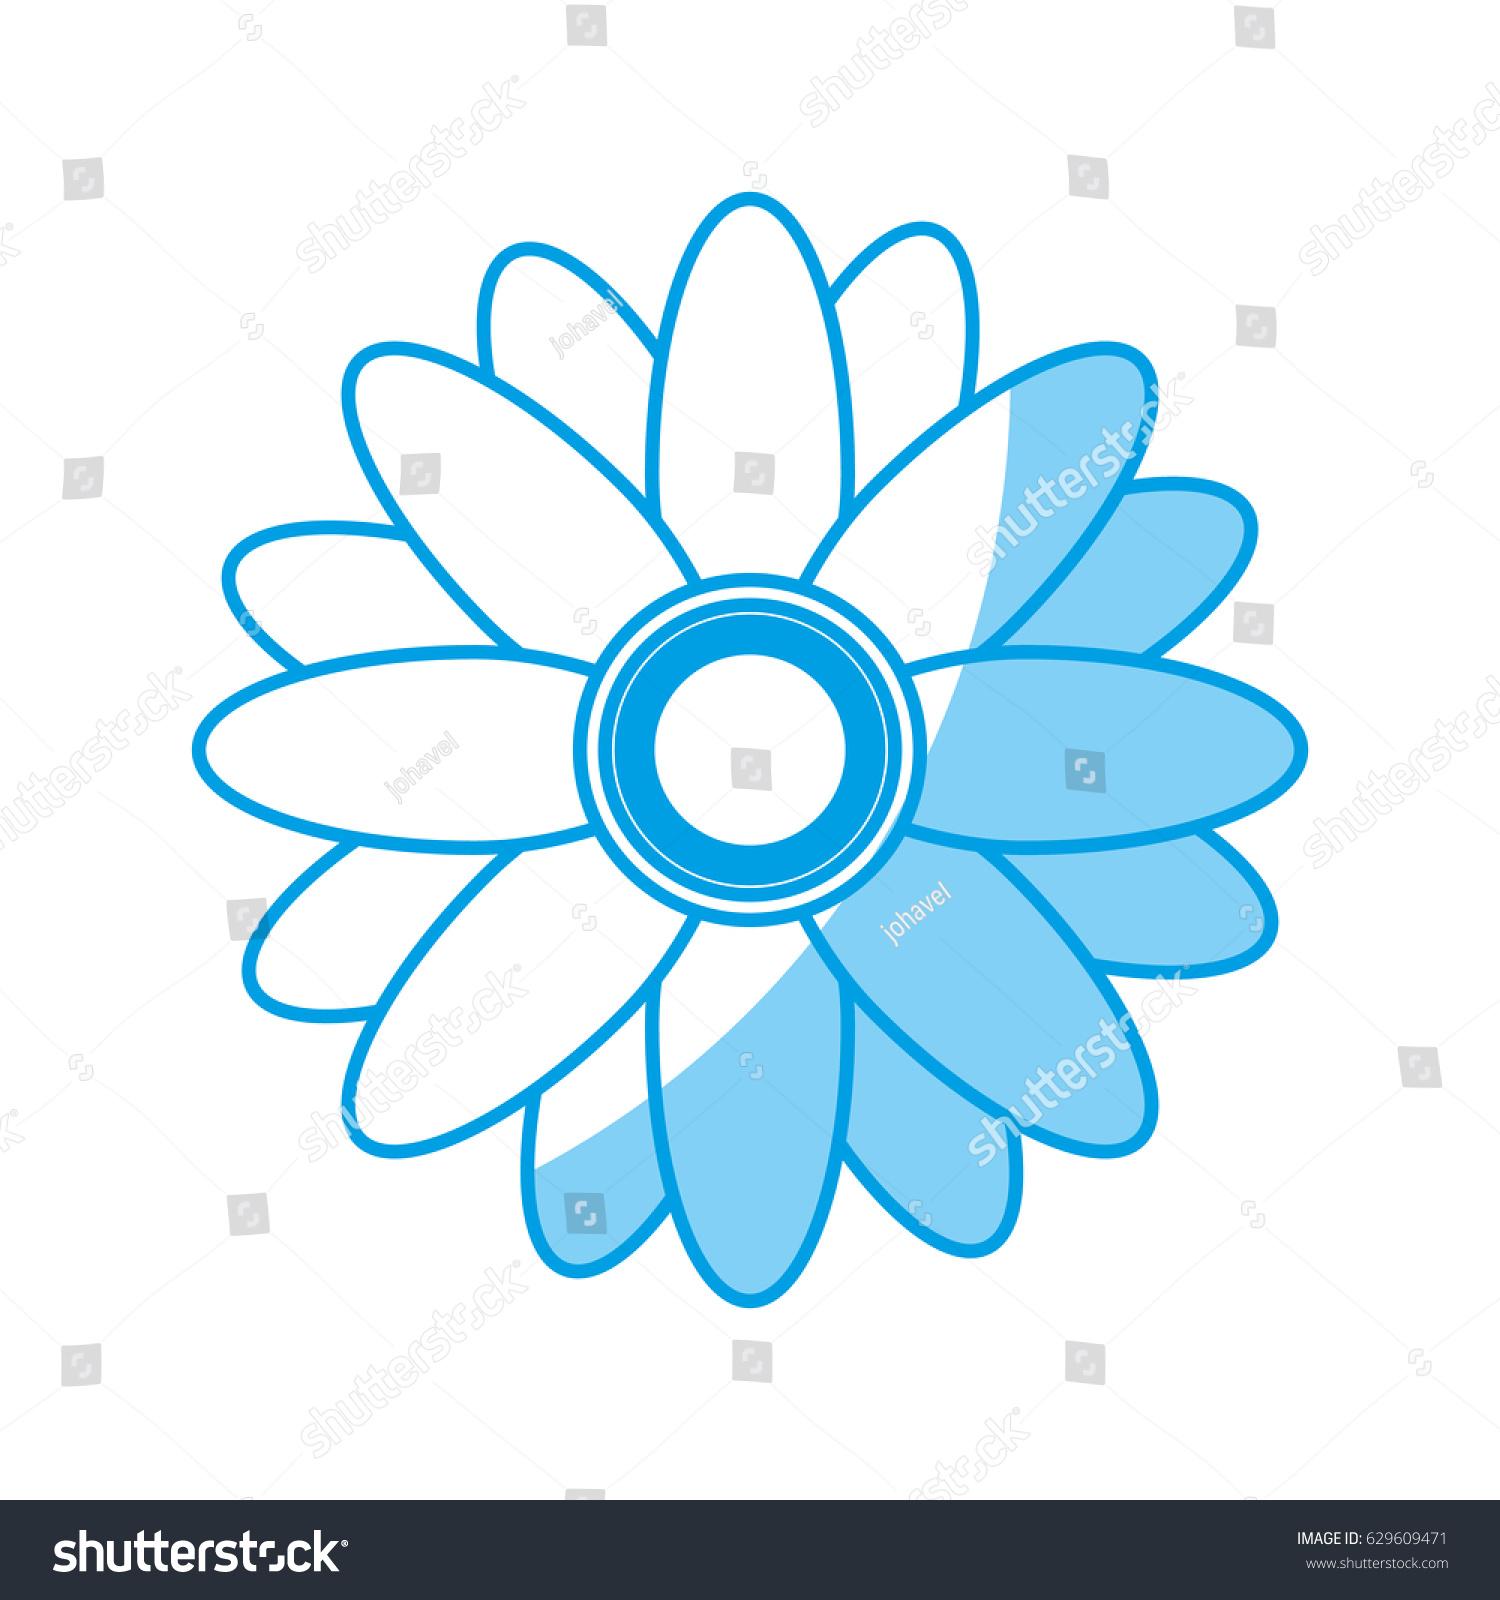 Beautiful flowers design stock vector 629609471 shutterstock beautiful flowers design izmirmasajfo